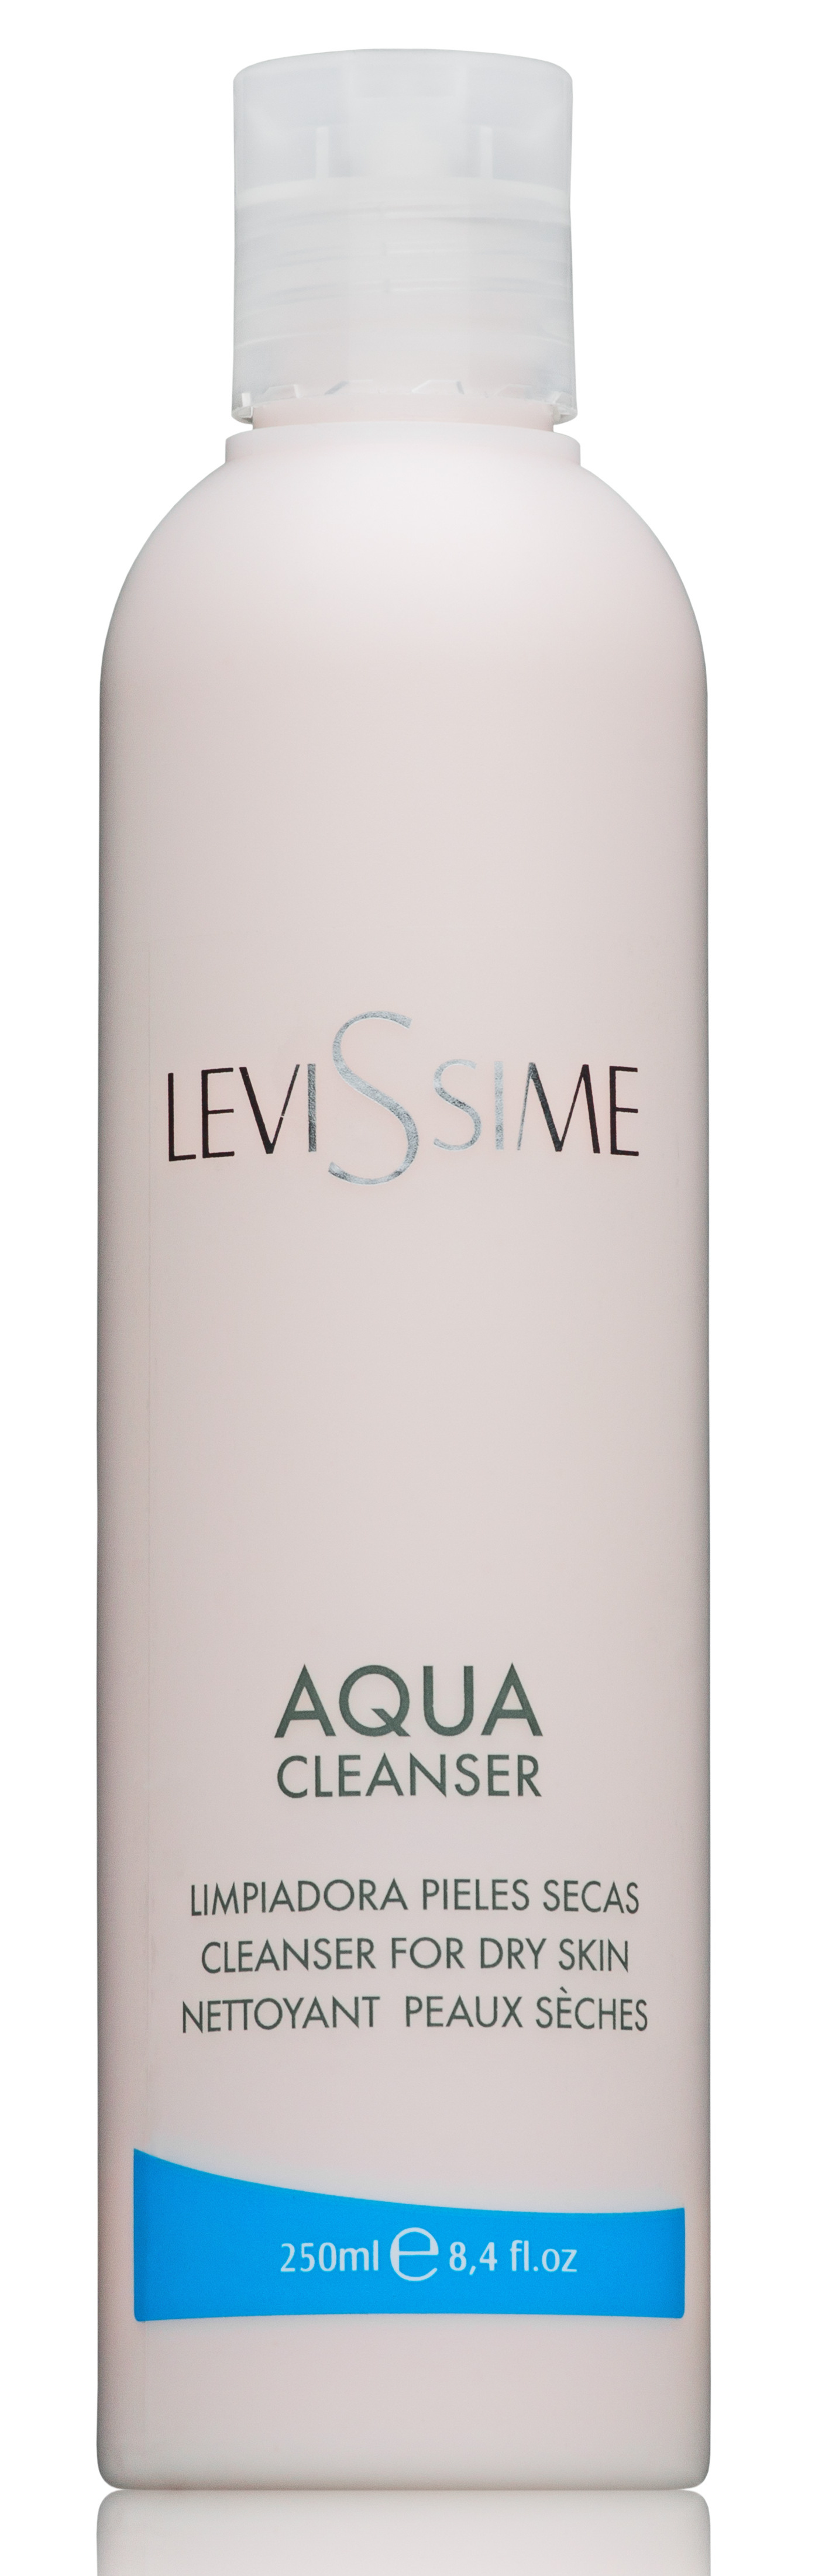 LEVISSIME Крем для снятия макияжа / Aqua Cleanser 250 мл